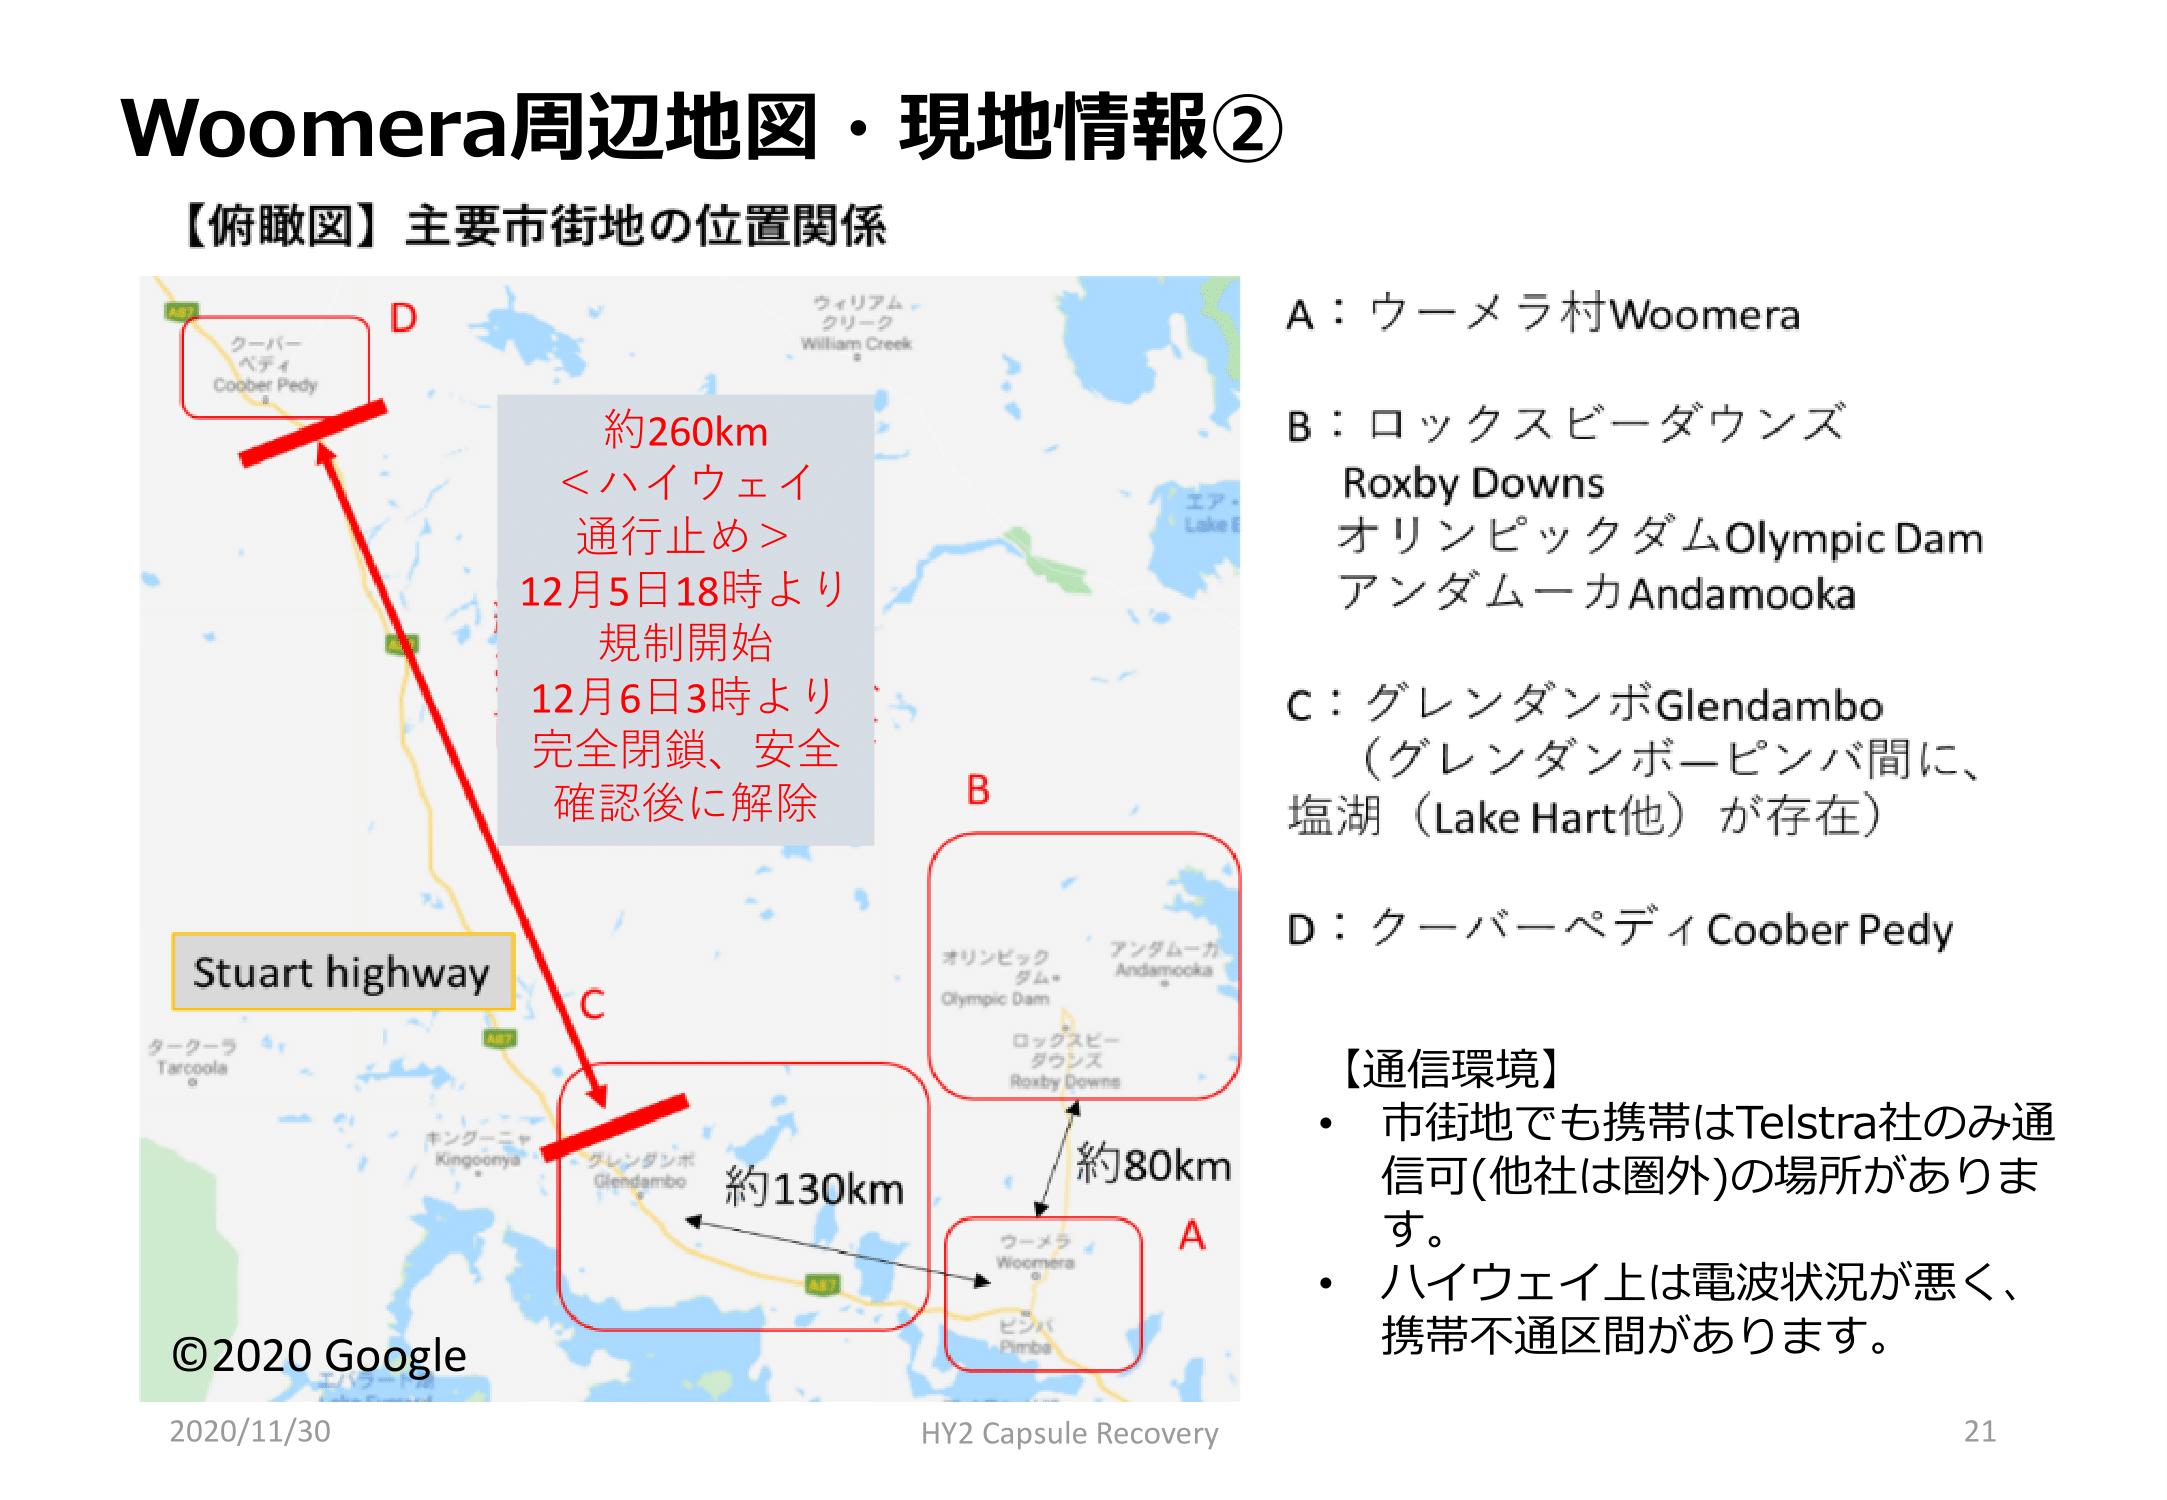 f:id:Imamura:20201130154538p:plain:h250